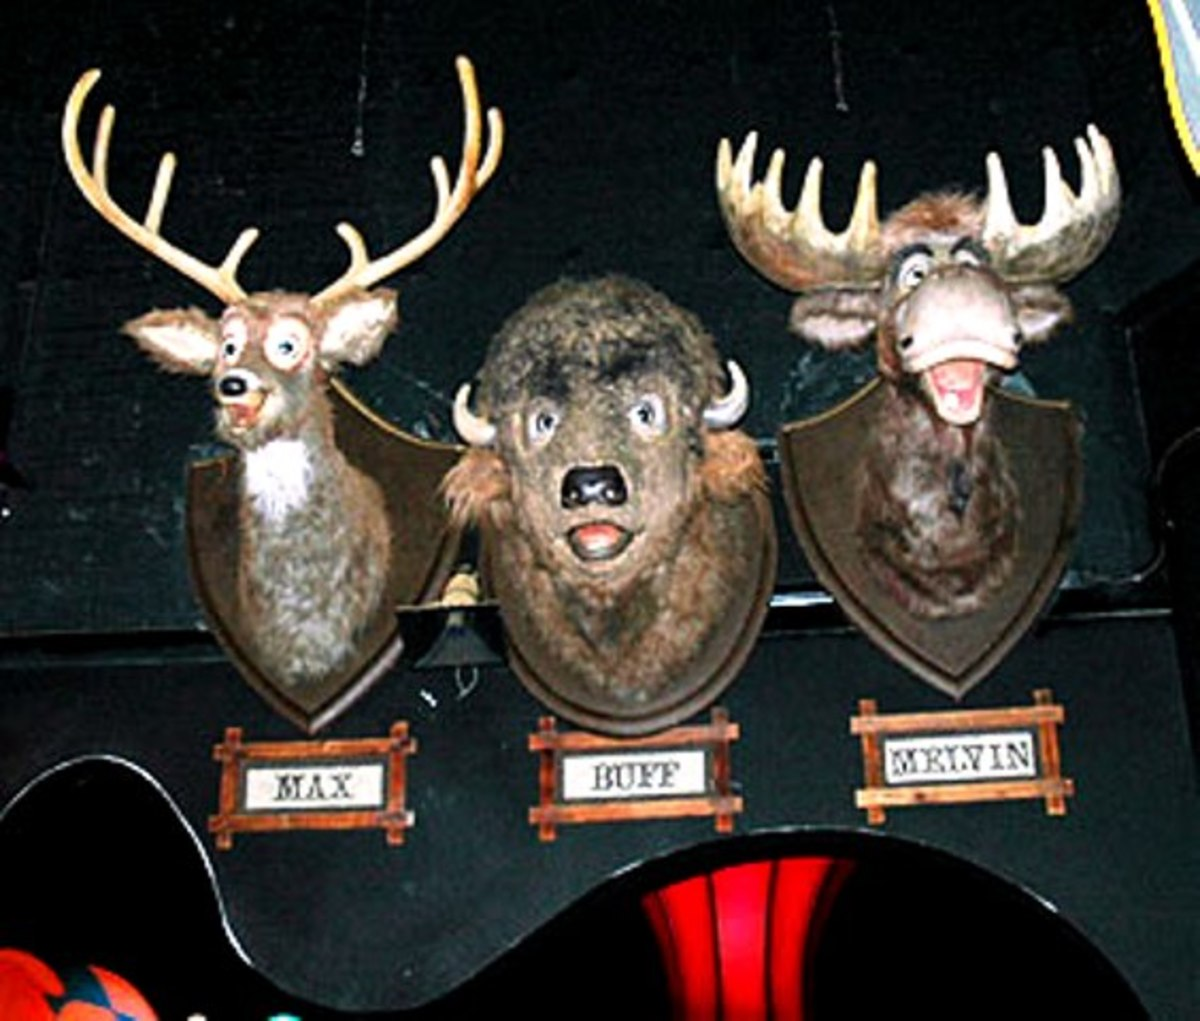 Buff, Max, and Melvin The Country Bear Jamboree 1972 - 2001